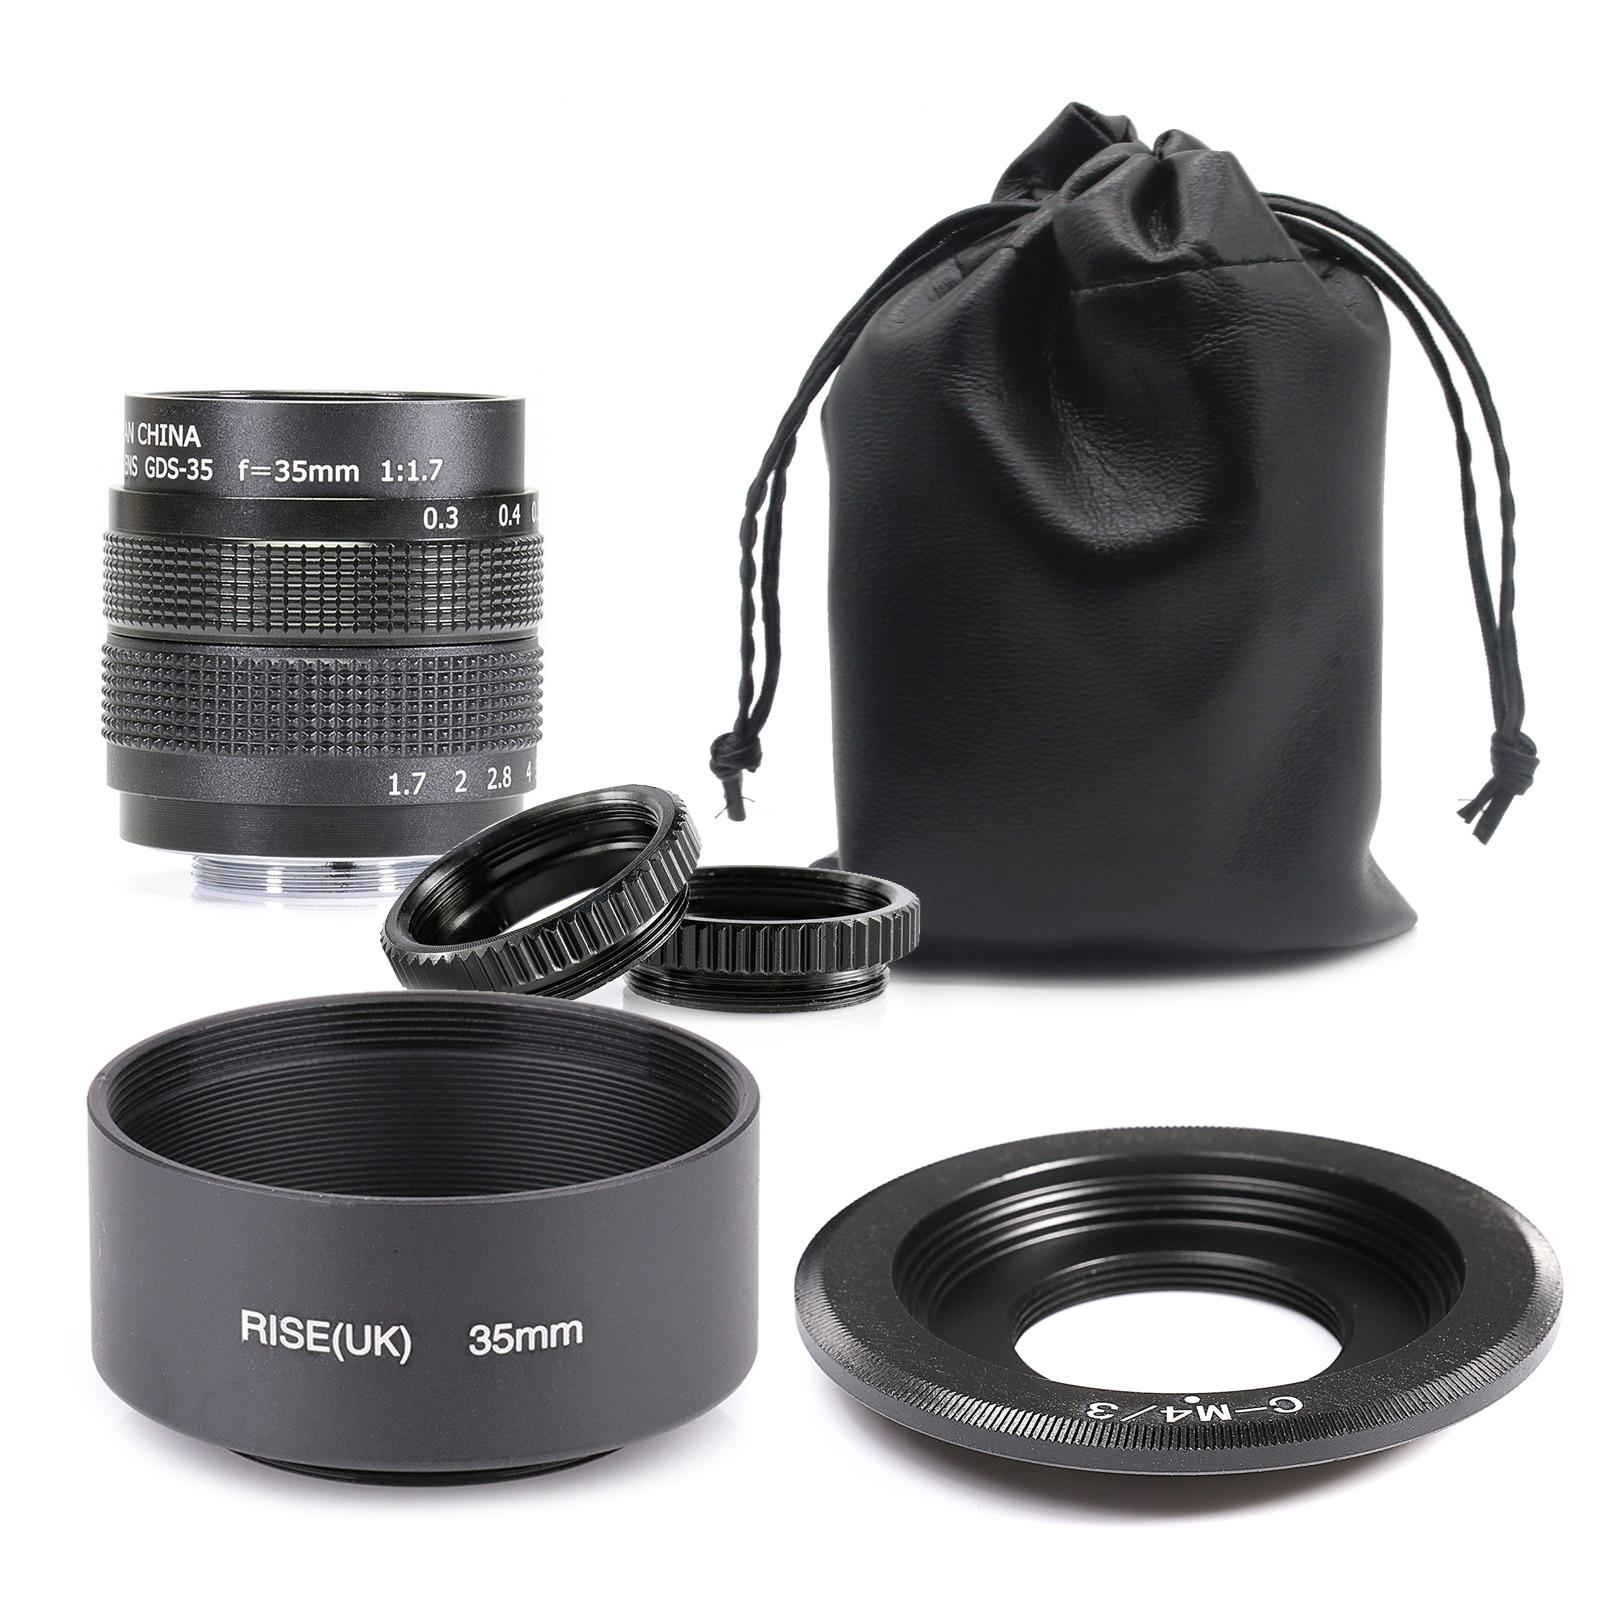 Fujian 35mm f/1,7 APS-C lente CCTV + anillo adaptador + 2 anillo Macro + capucha de lente para P anasonic/O linpus Micro4/3 M4/3 cámara sin espejo